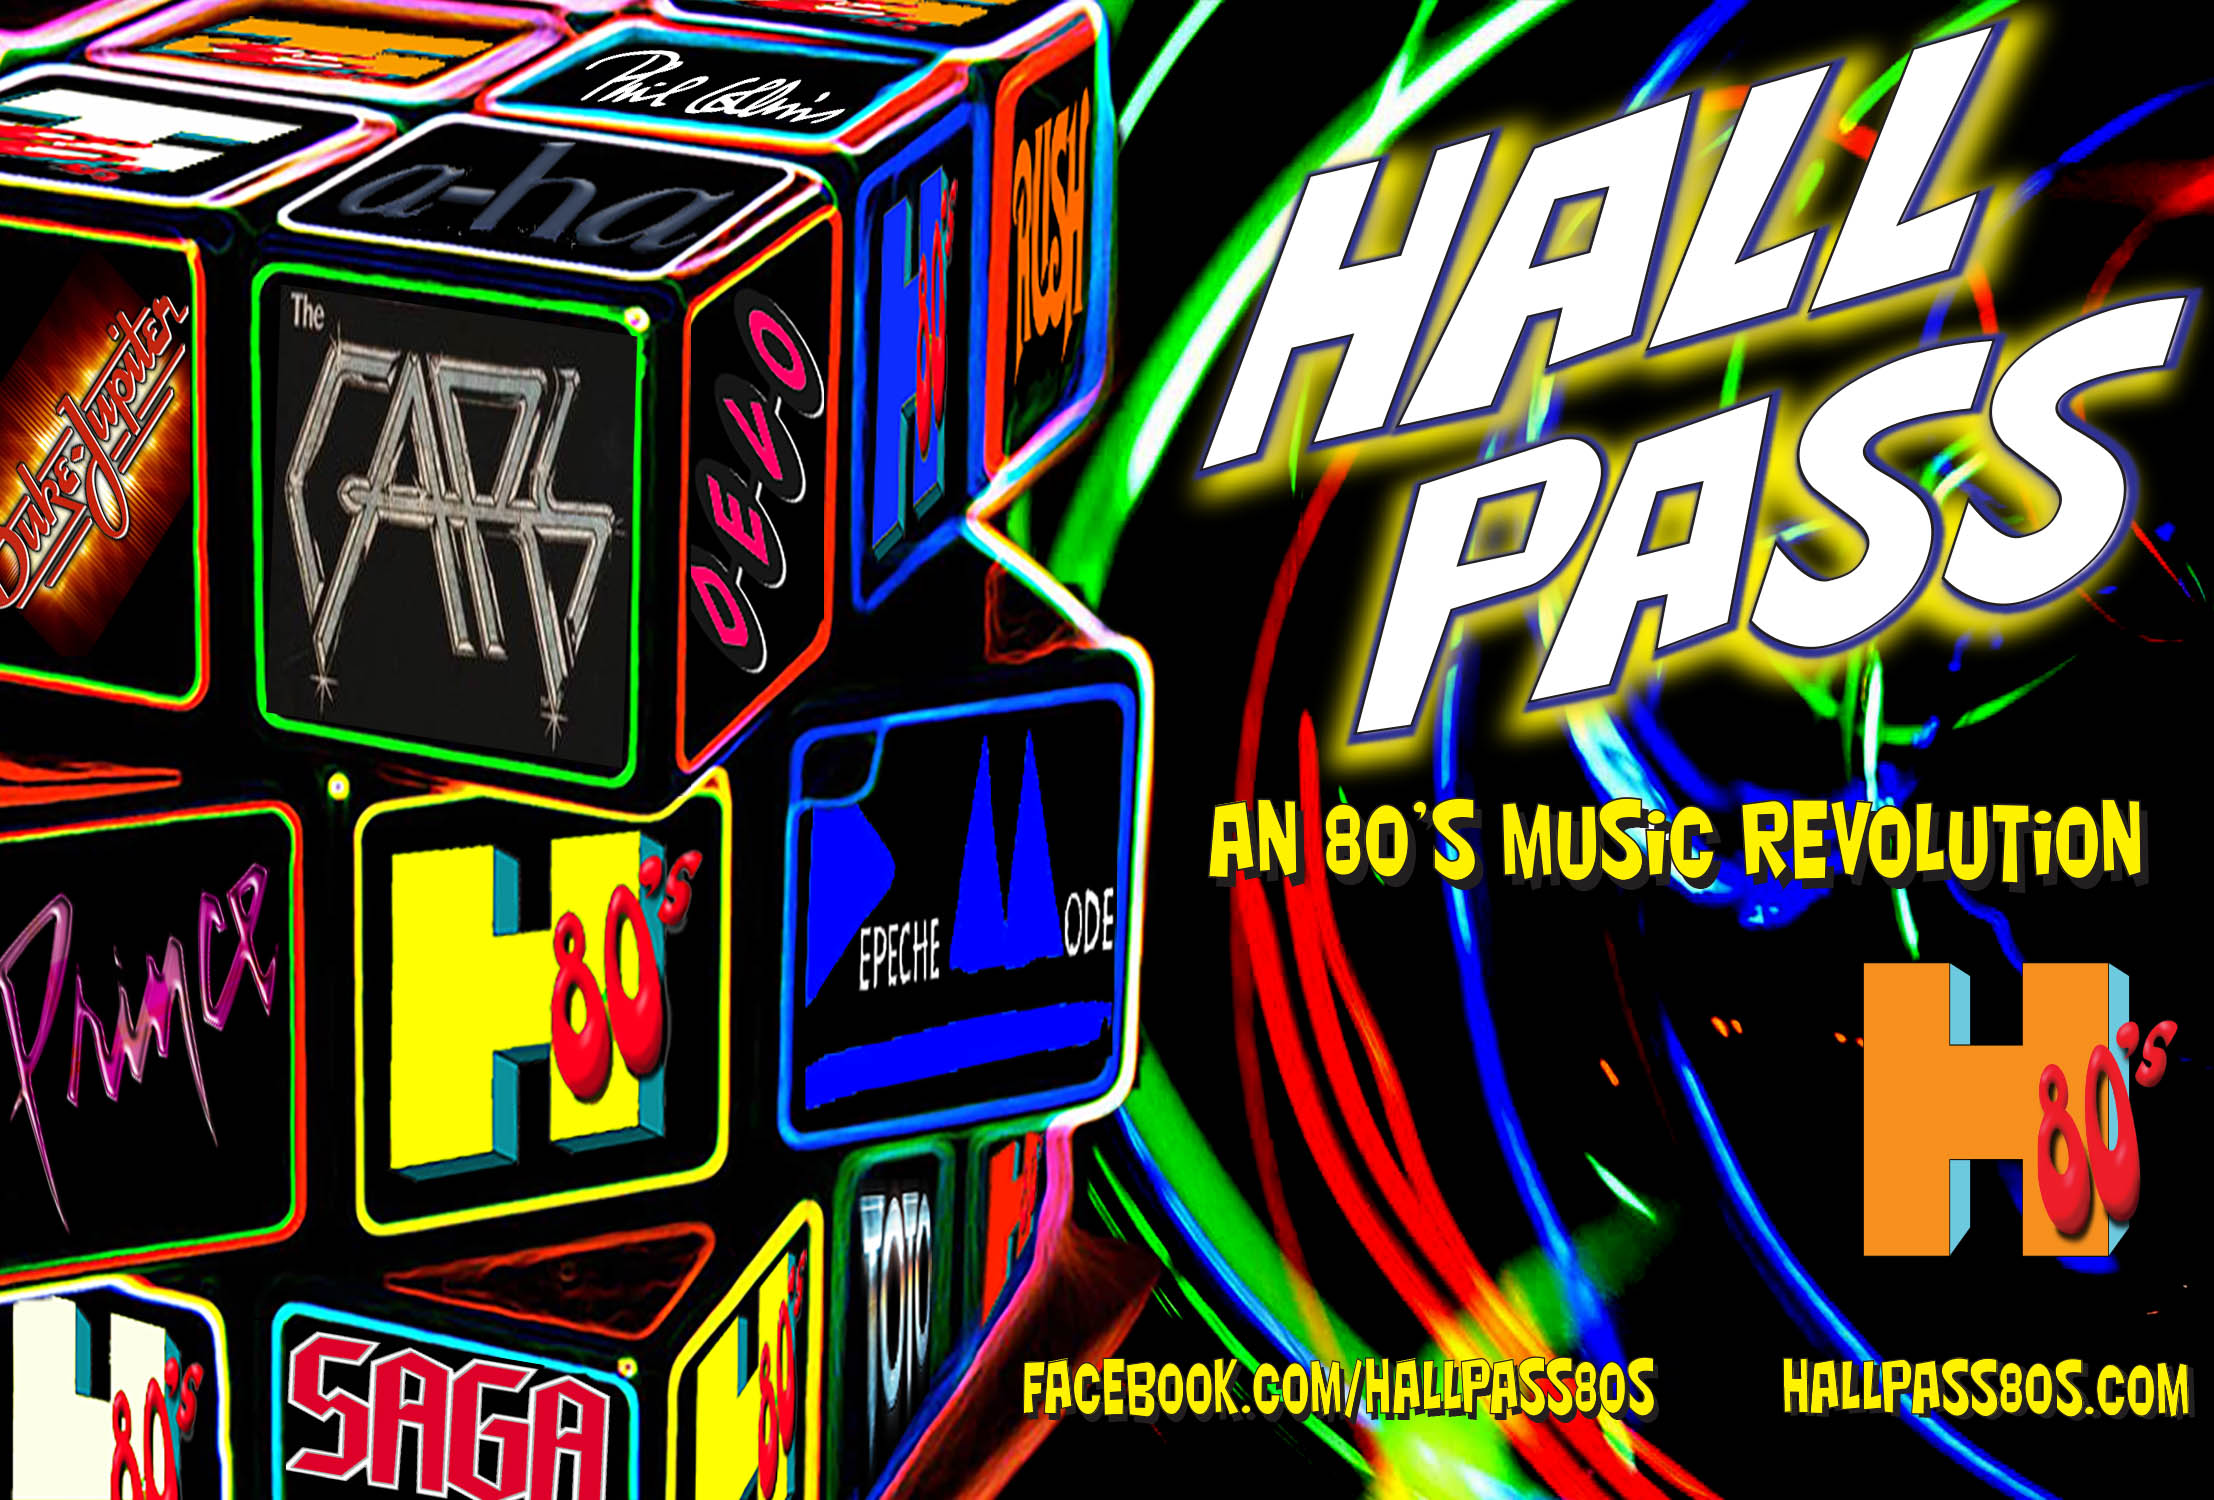 HP_Cube_neon_Poster_hs_artists_7.38x5_300dpi.jpg